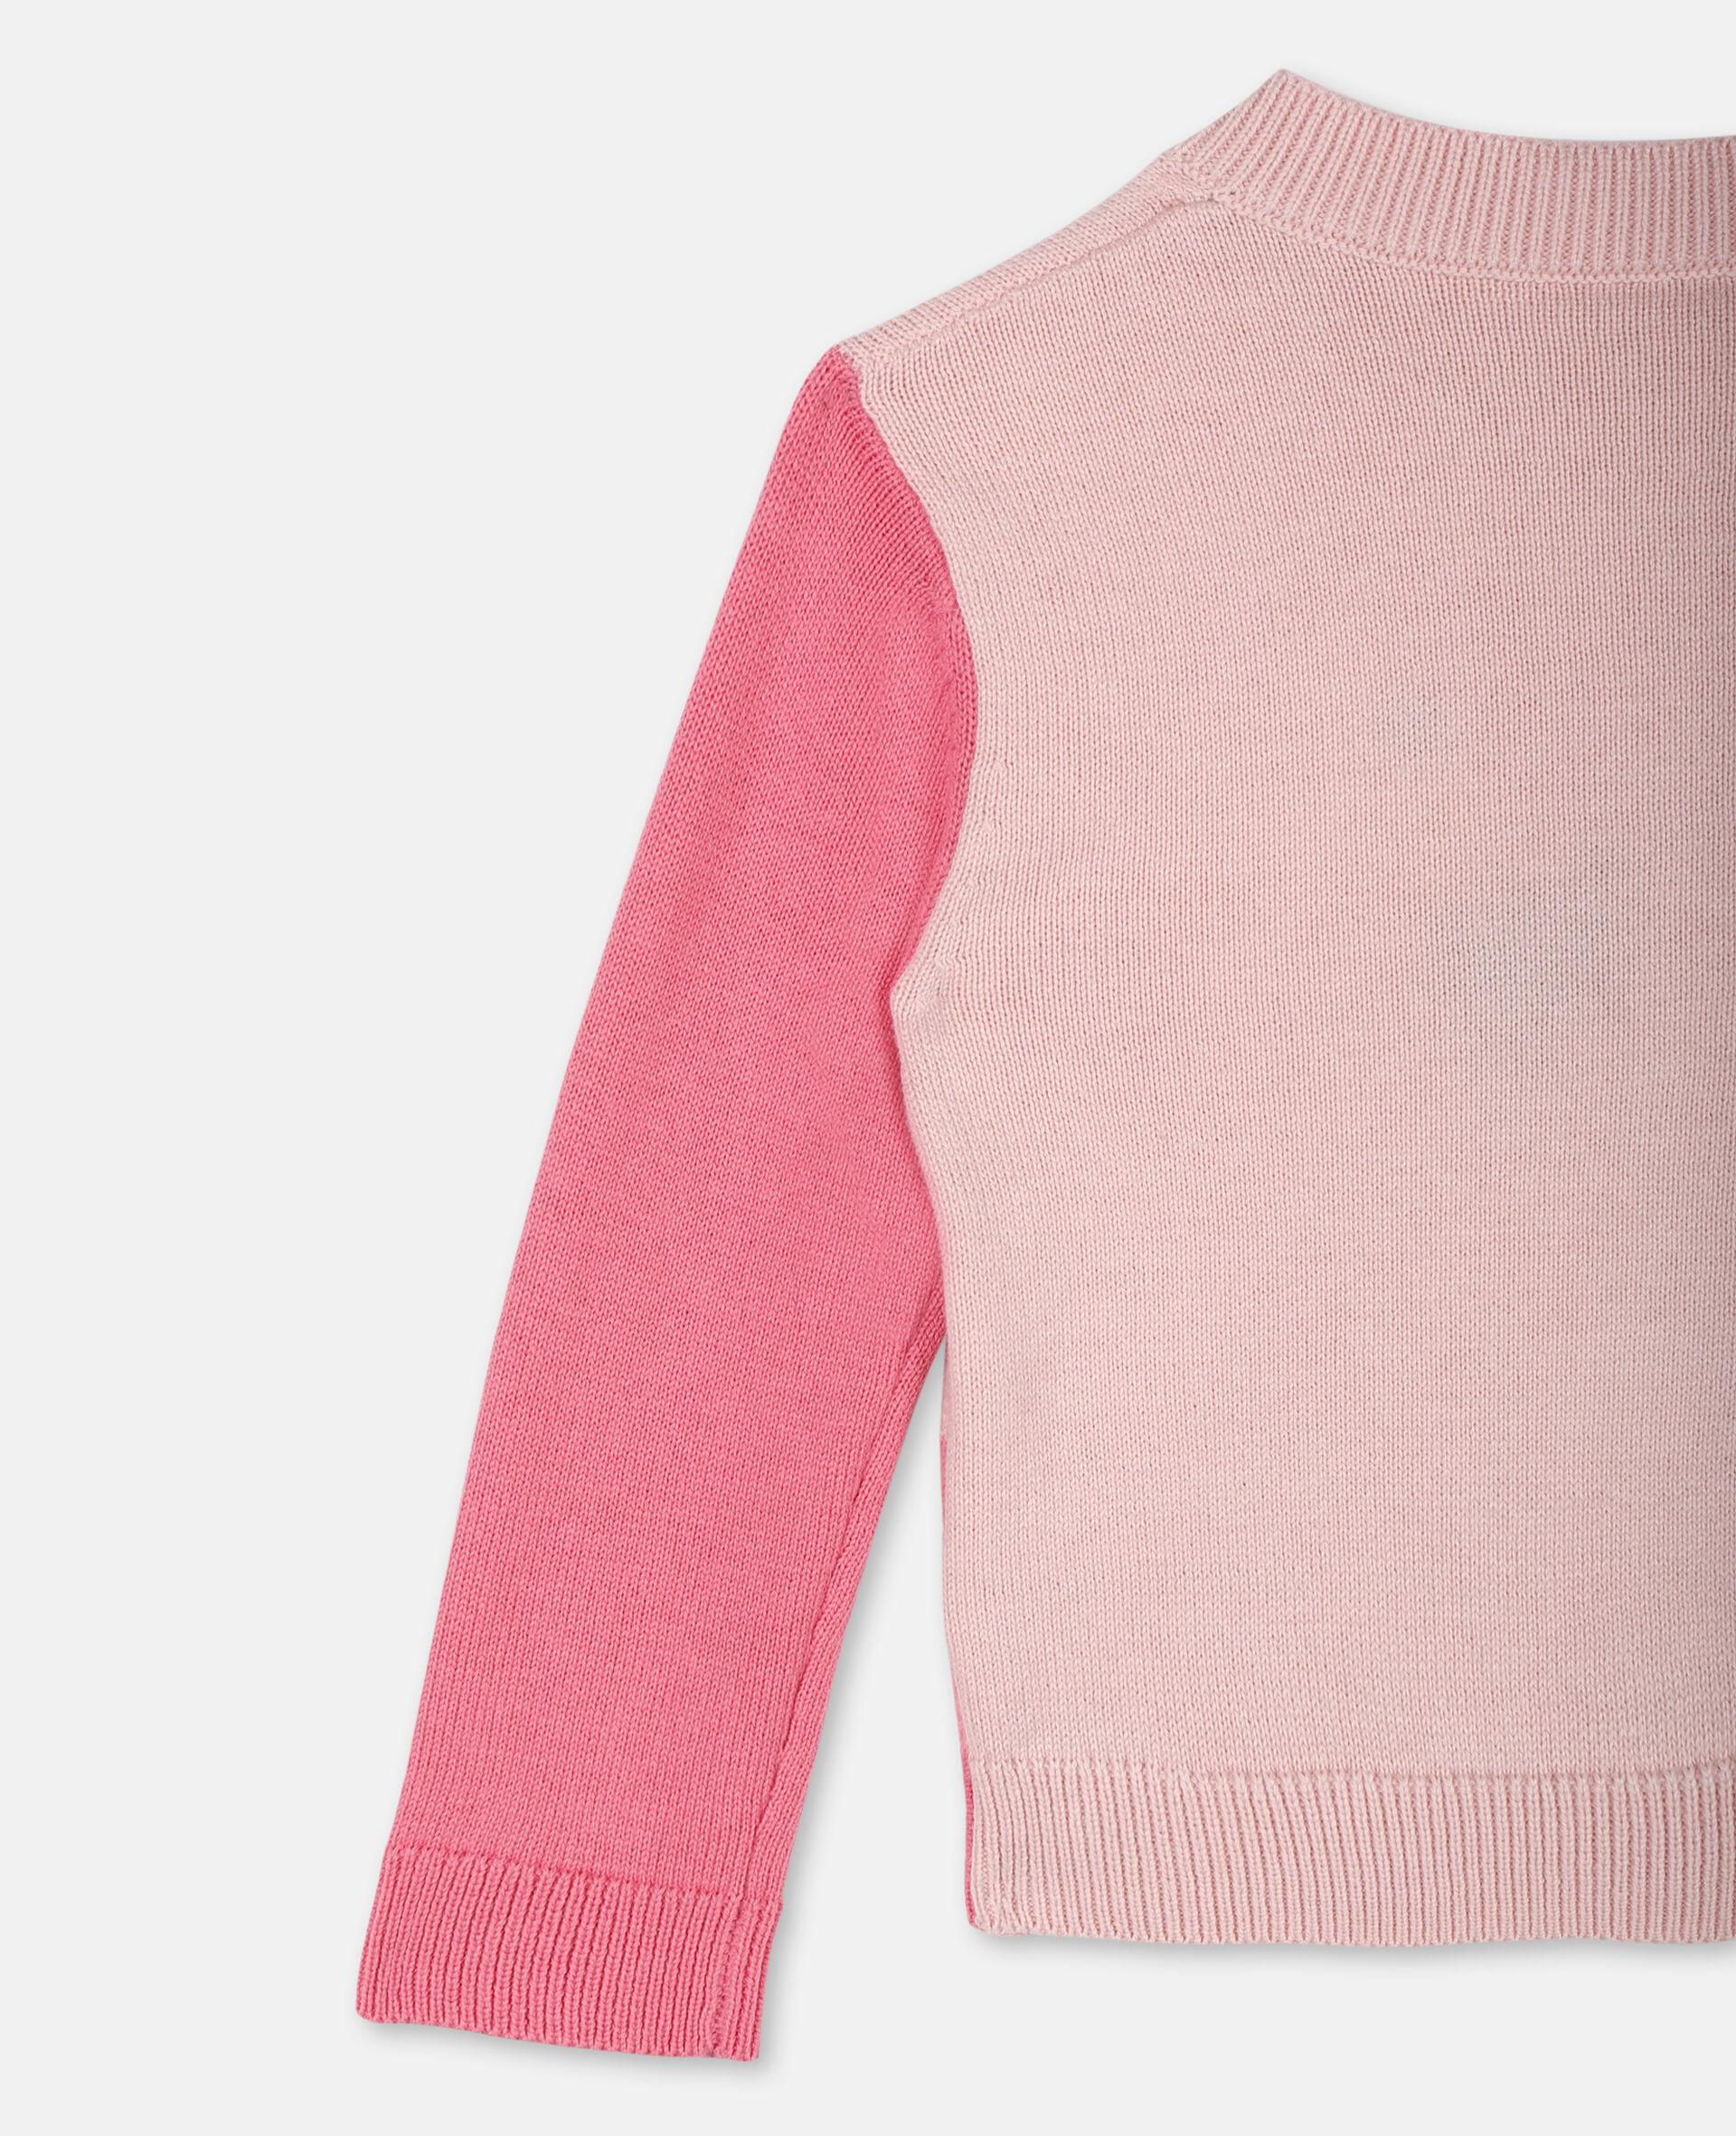 Flamingo Intarsia Knit Cotton Cardigan -Pink-large image number 2